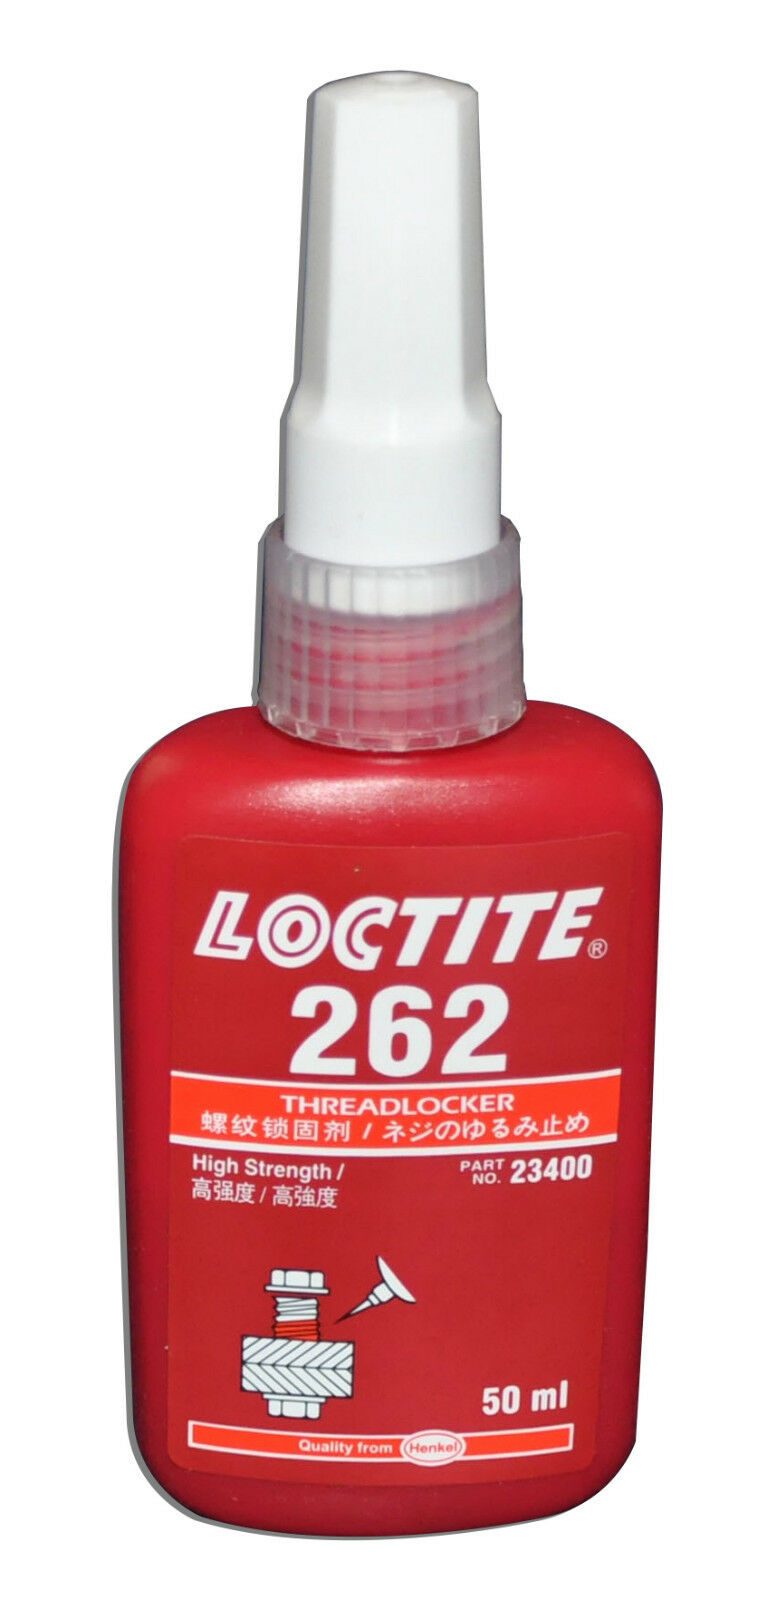 LOCTITE 262 HIGH STRENGTH THREADLOCKER HIGH STRENGTH LIQUID – 50 ML Adhesives, Sealants & Tapes